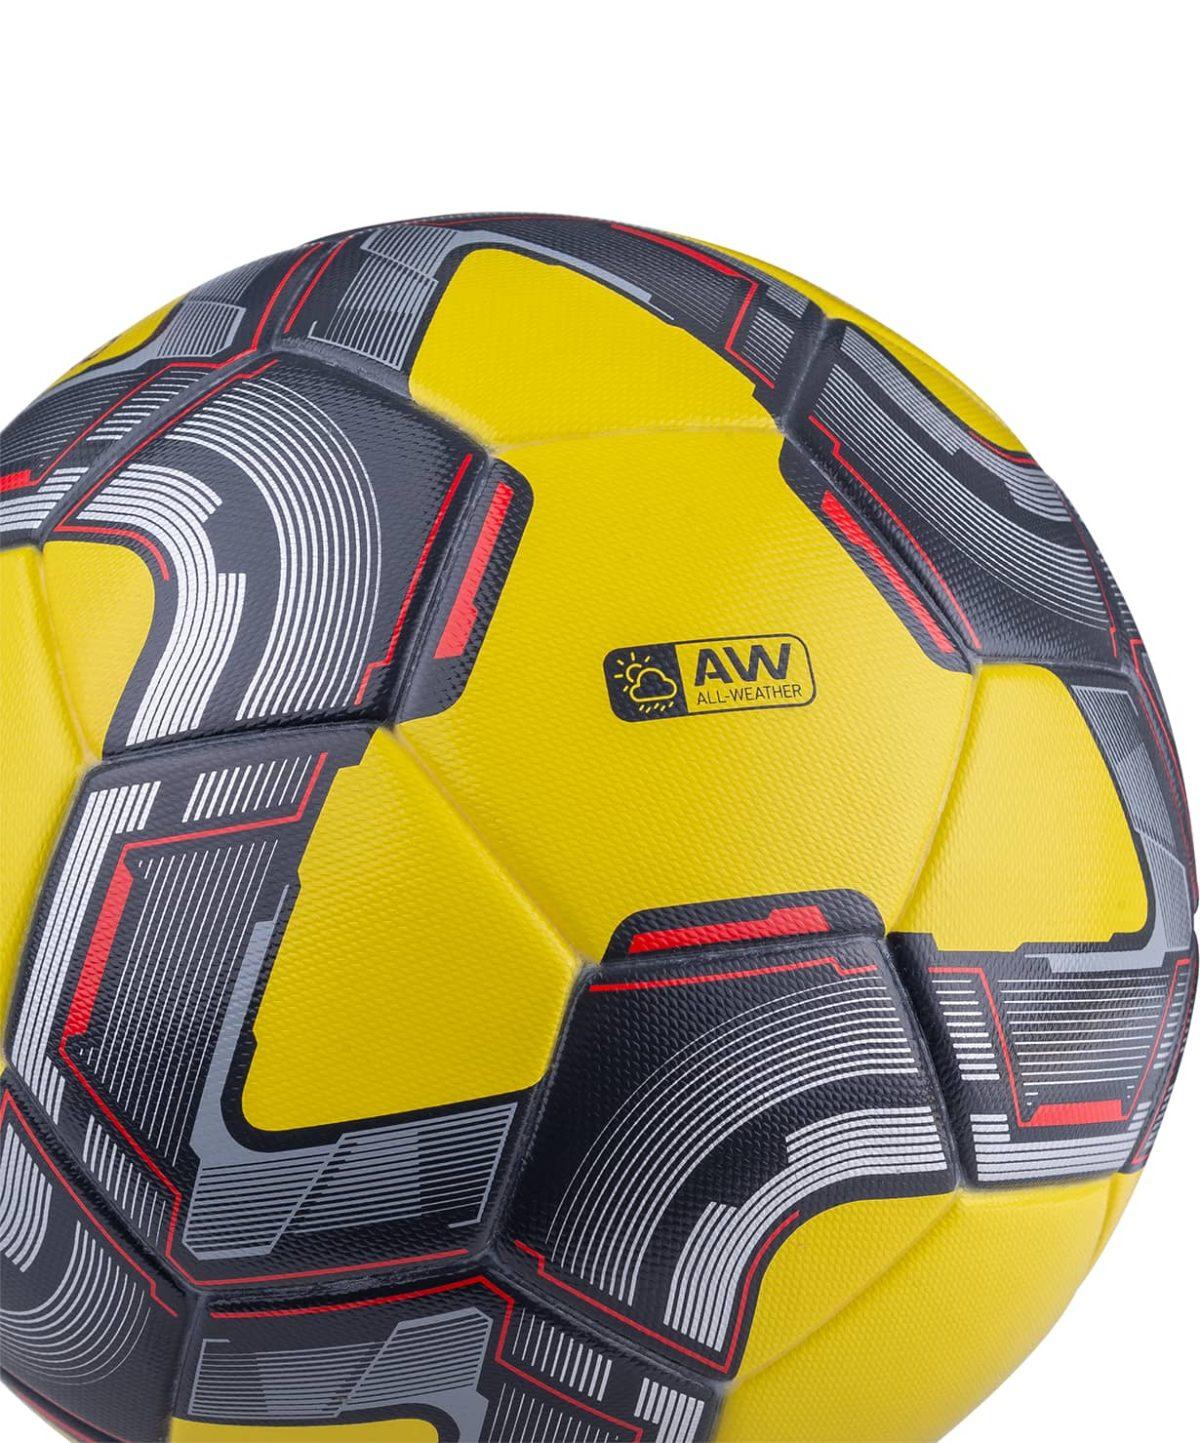 JOGEL Grand Мяч футбольный  Grand №5 (BC20) - 2